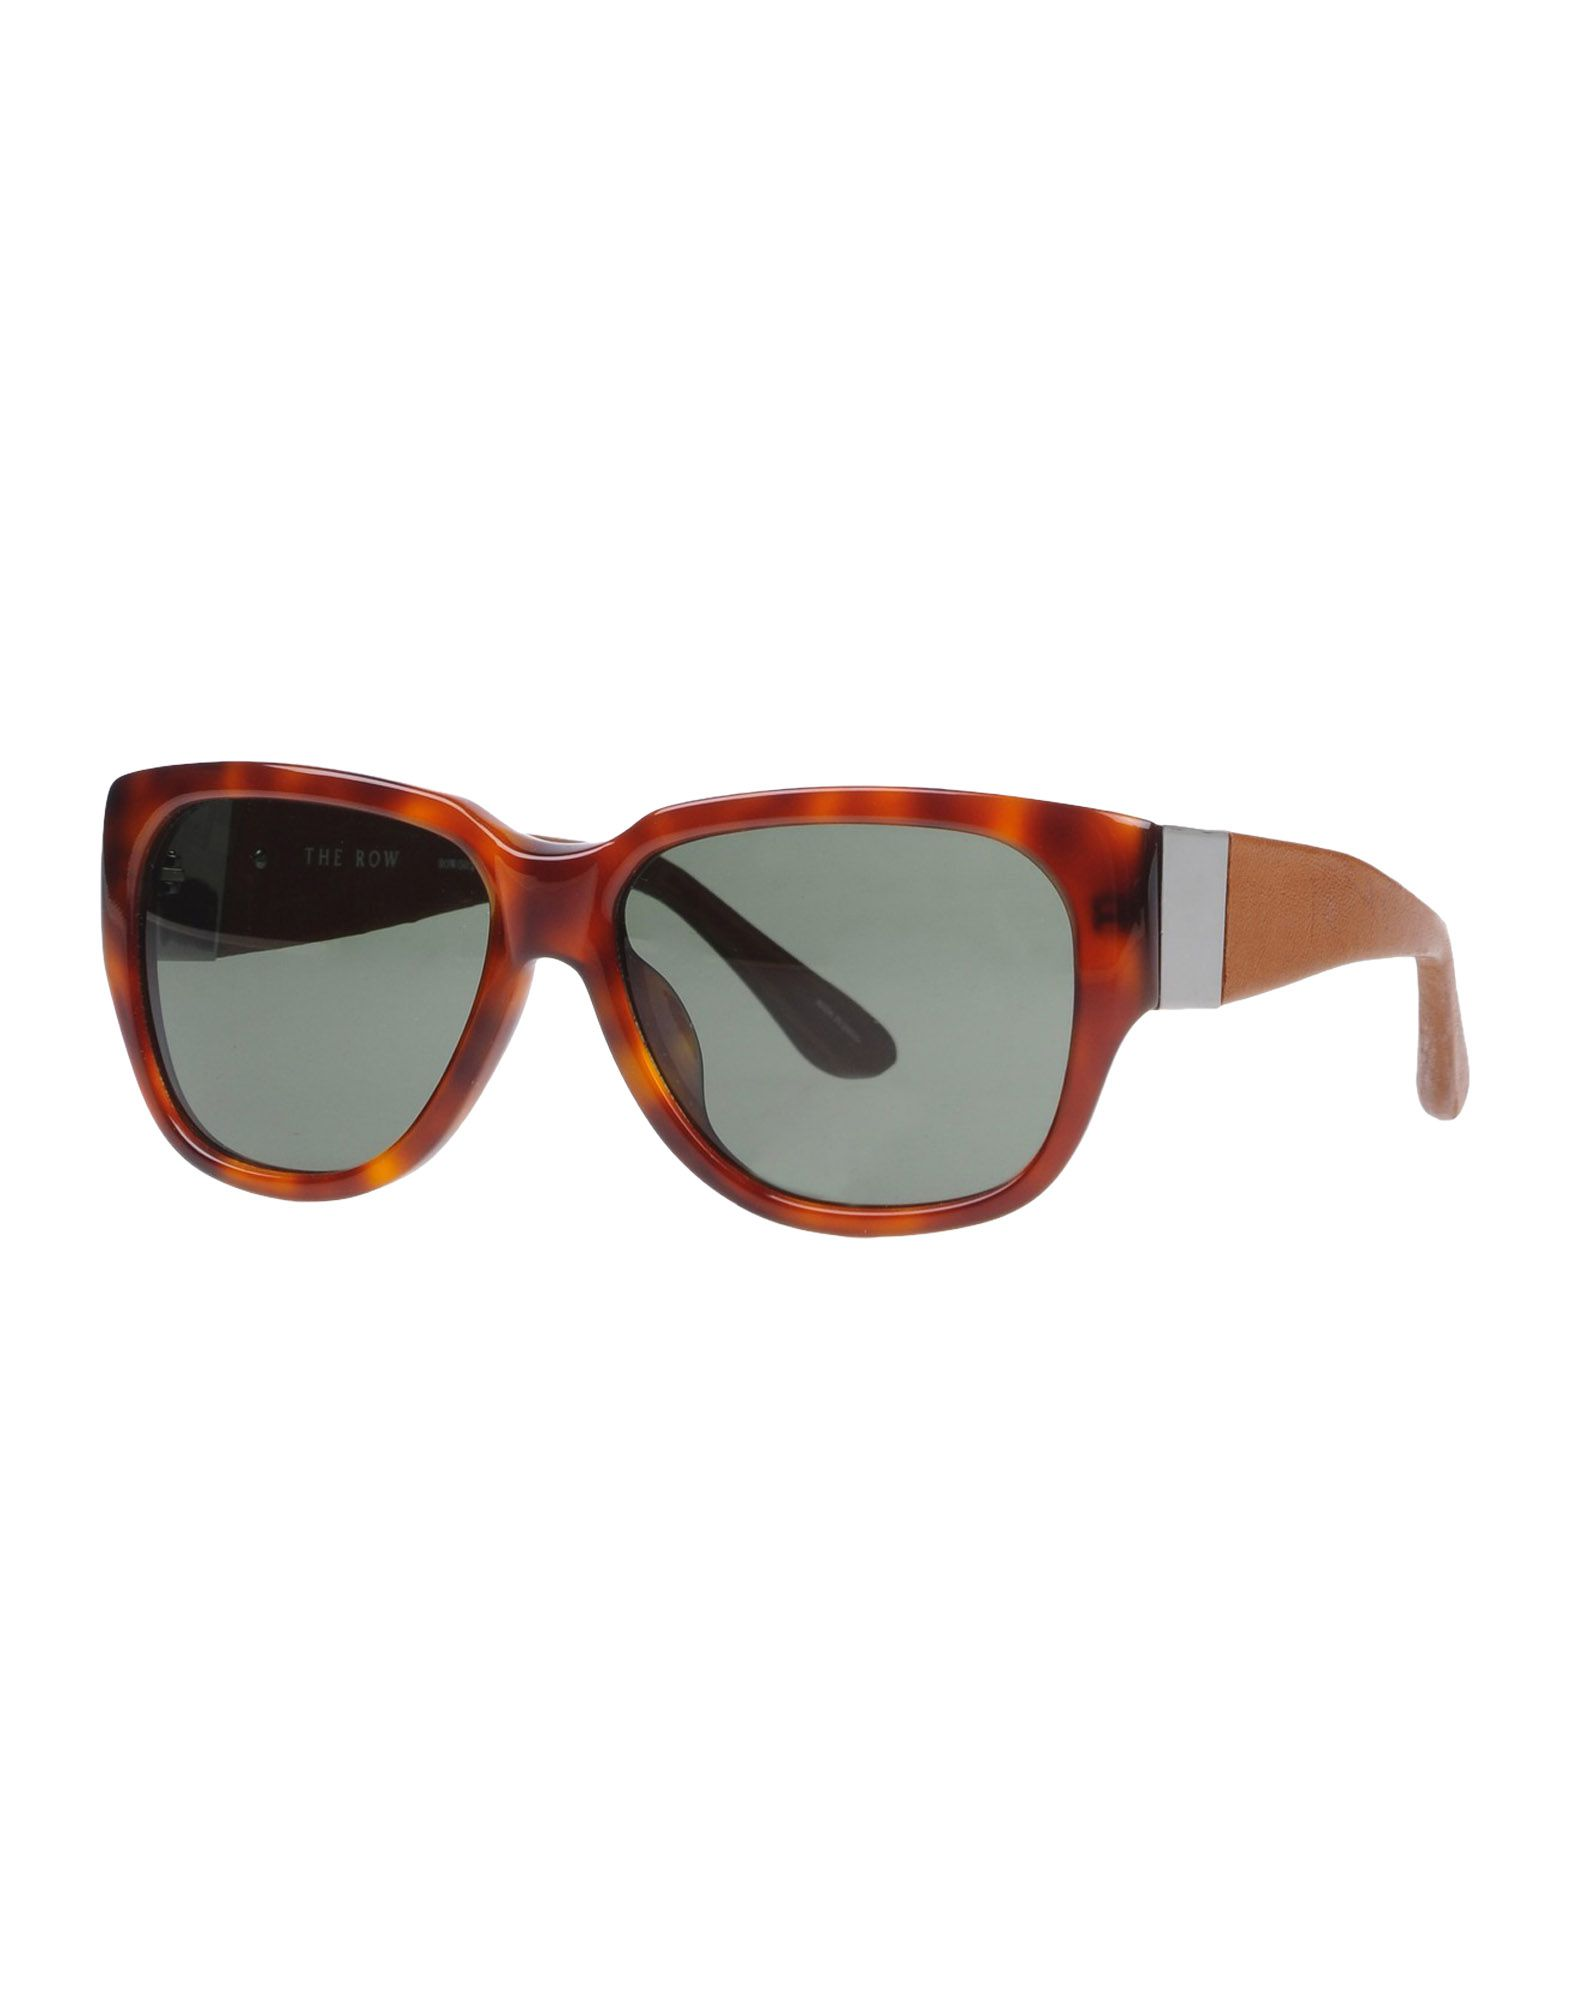 THE ROW BY LINDA FARROW Солнечные очки the row кожаные леггинсы